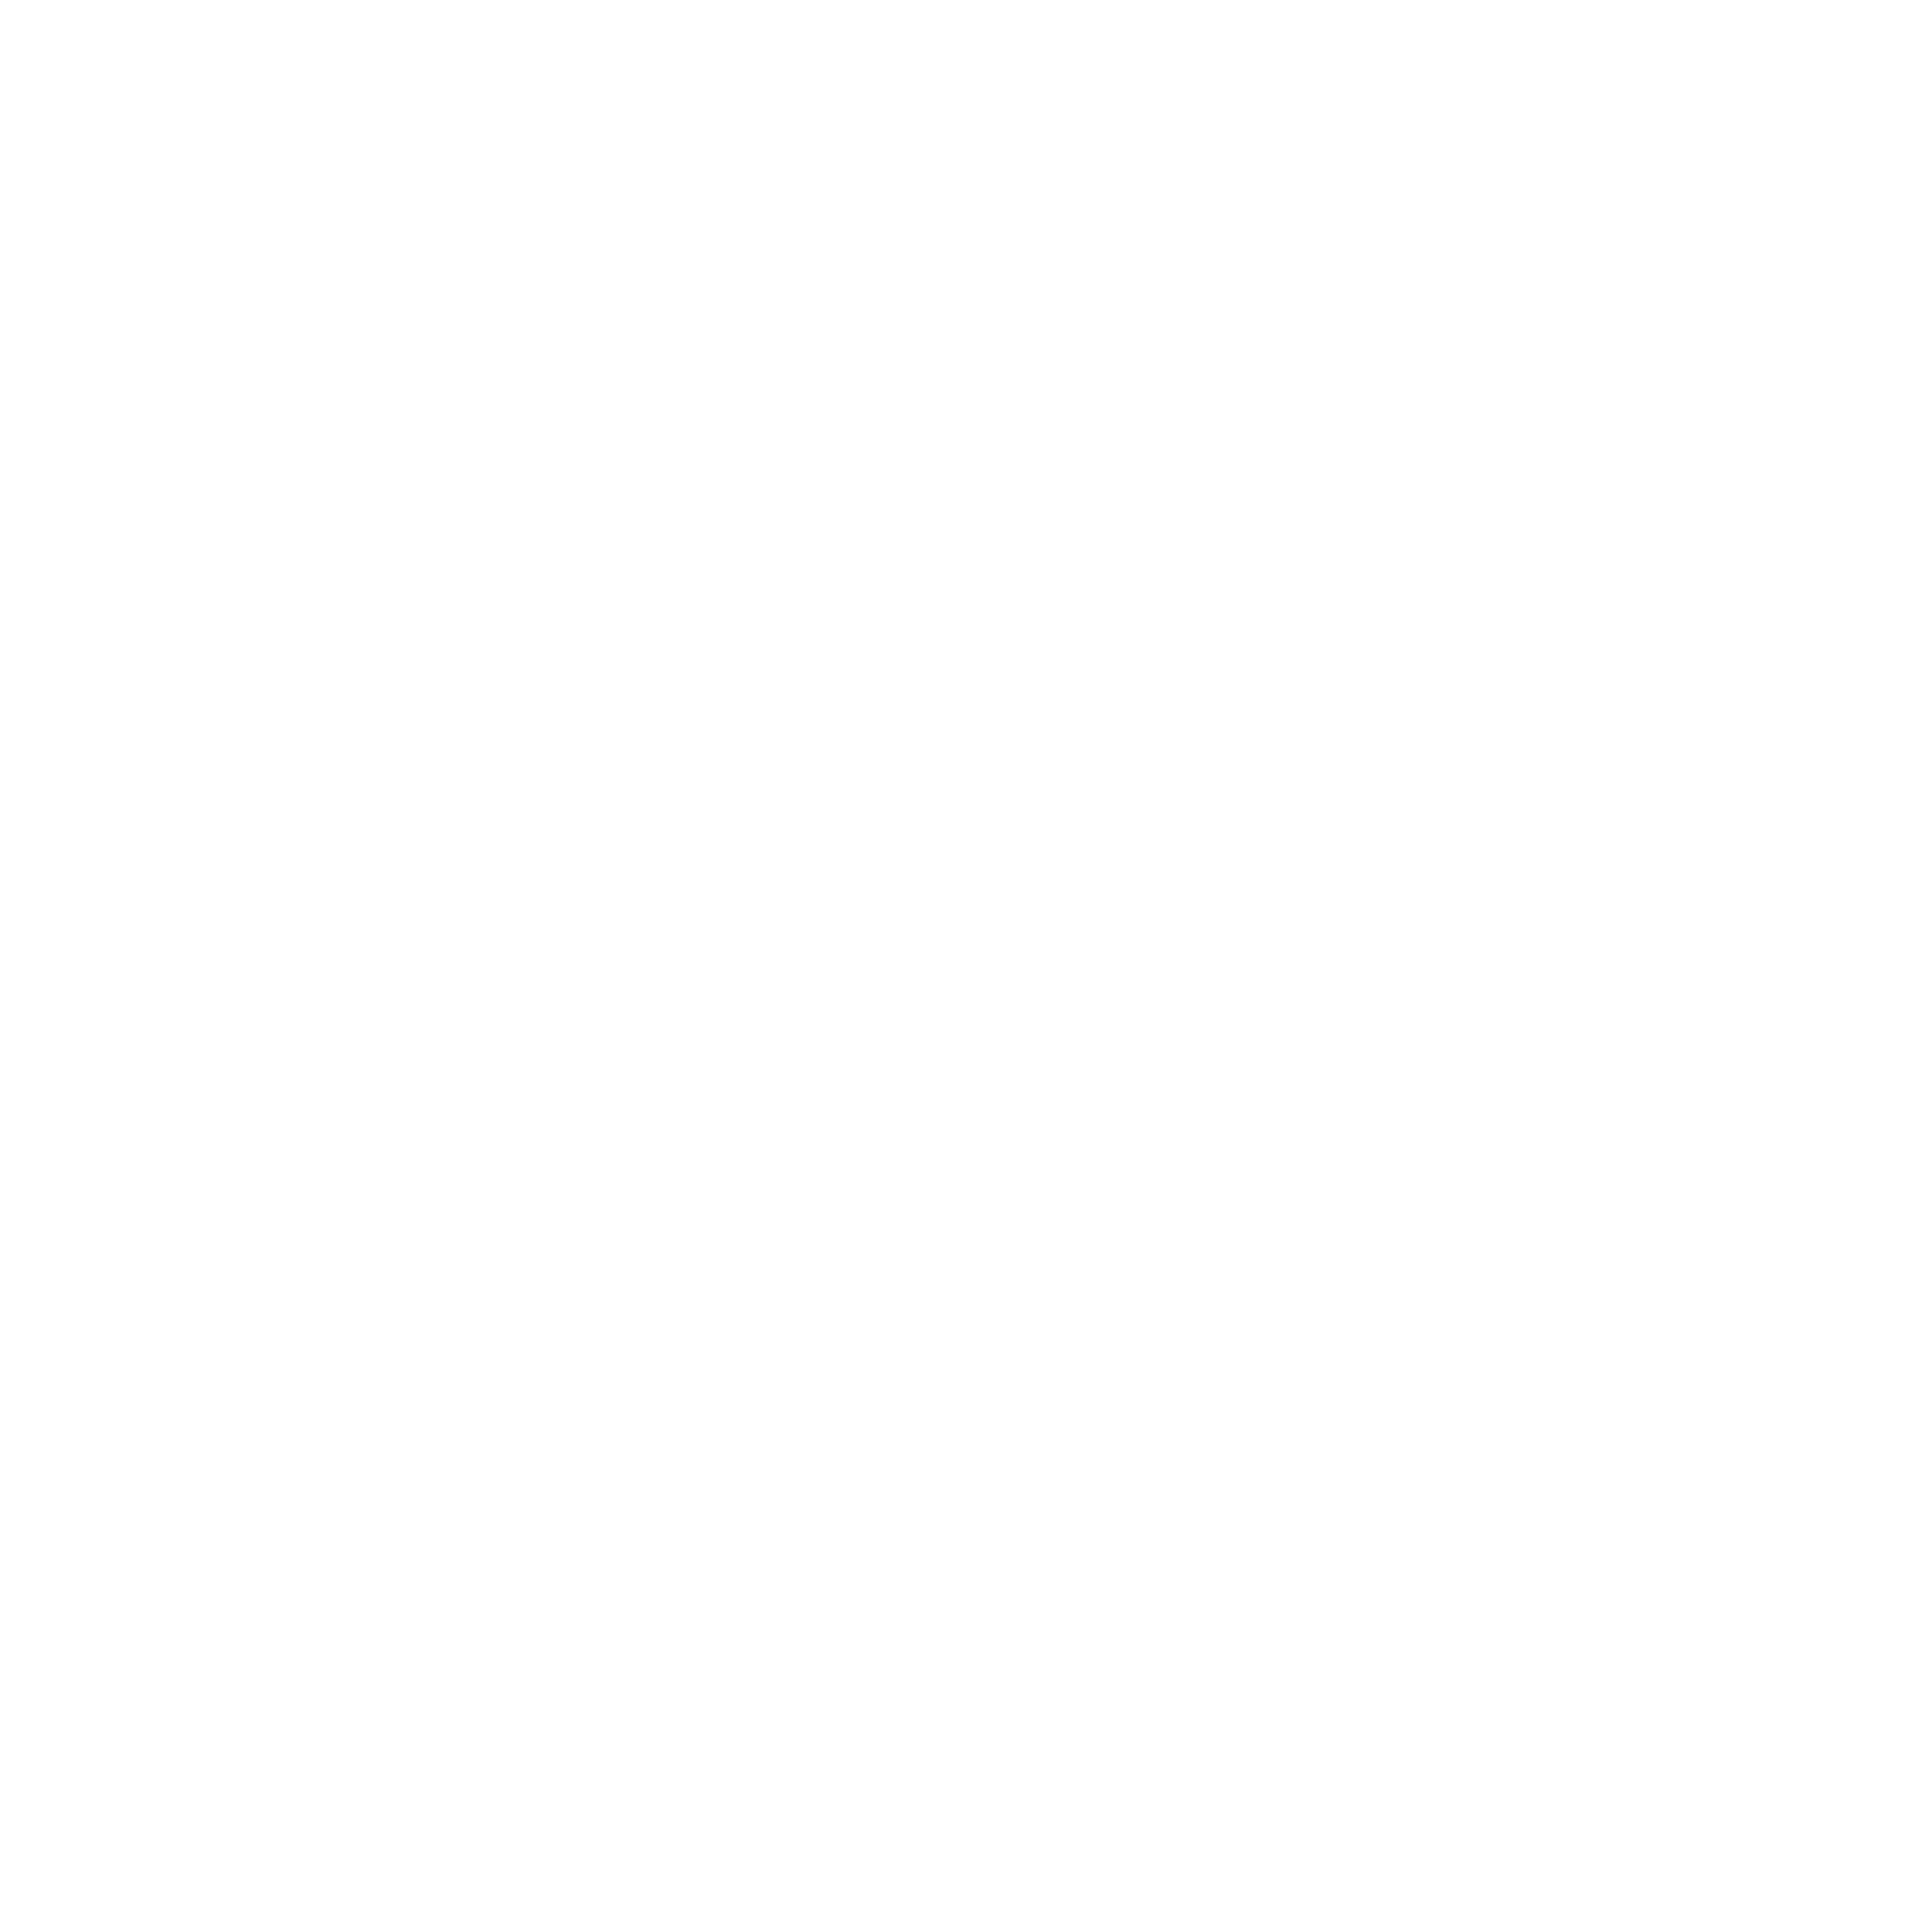 Kait Swanson Photography